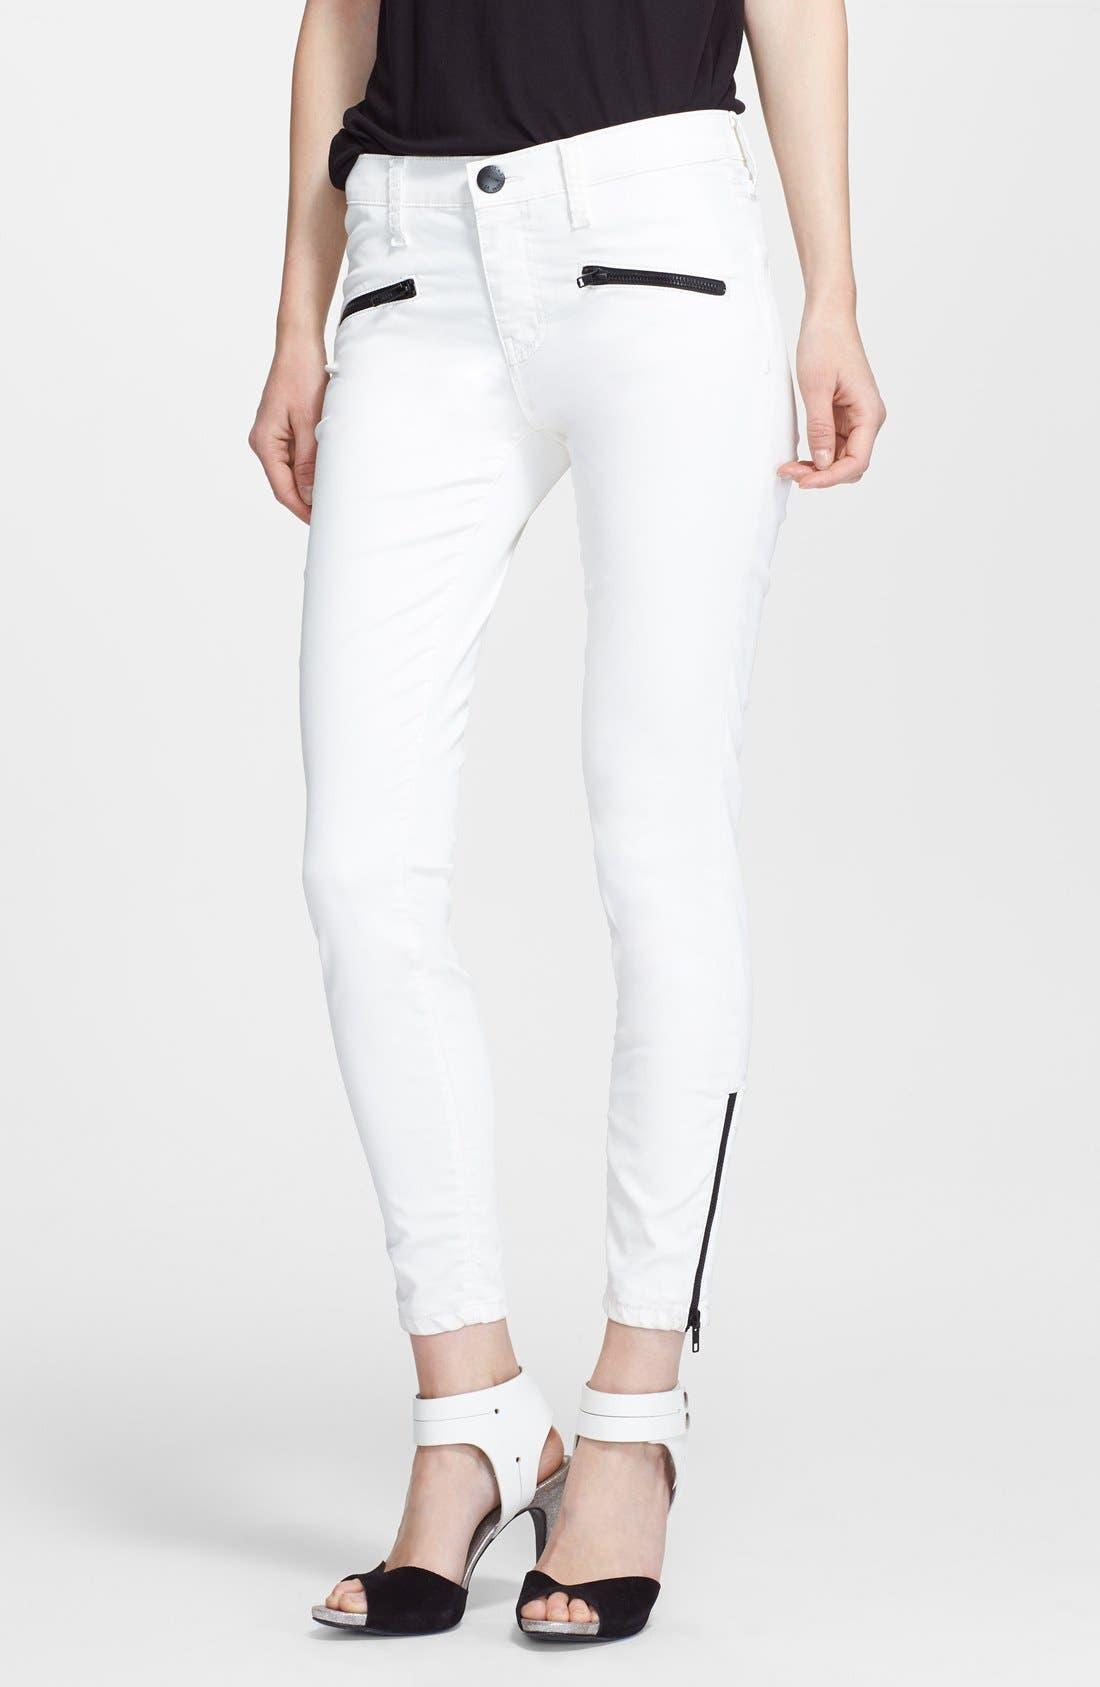 Alternate Image 1 Selected - Current/Elliott 'The Soho Zip Stiletto' Skinny Jeans (Sugar Coated)